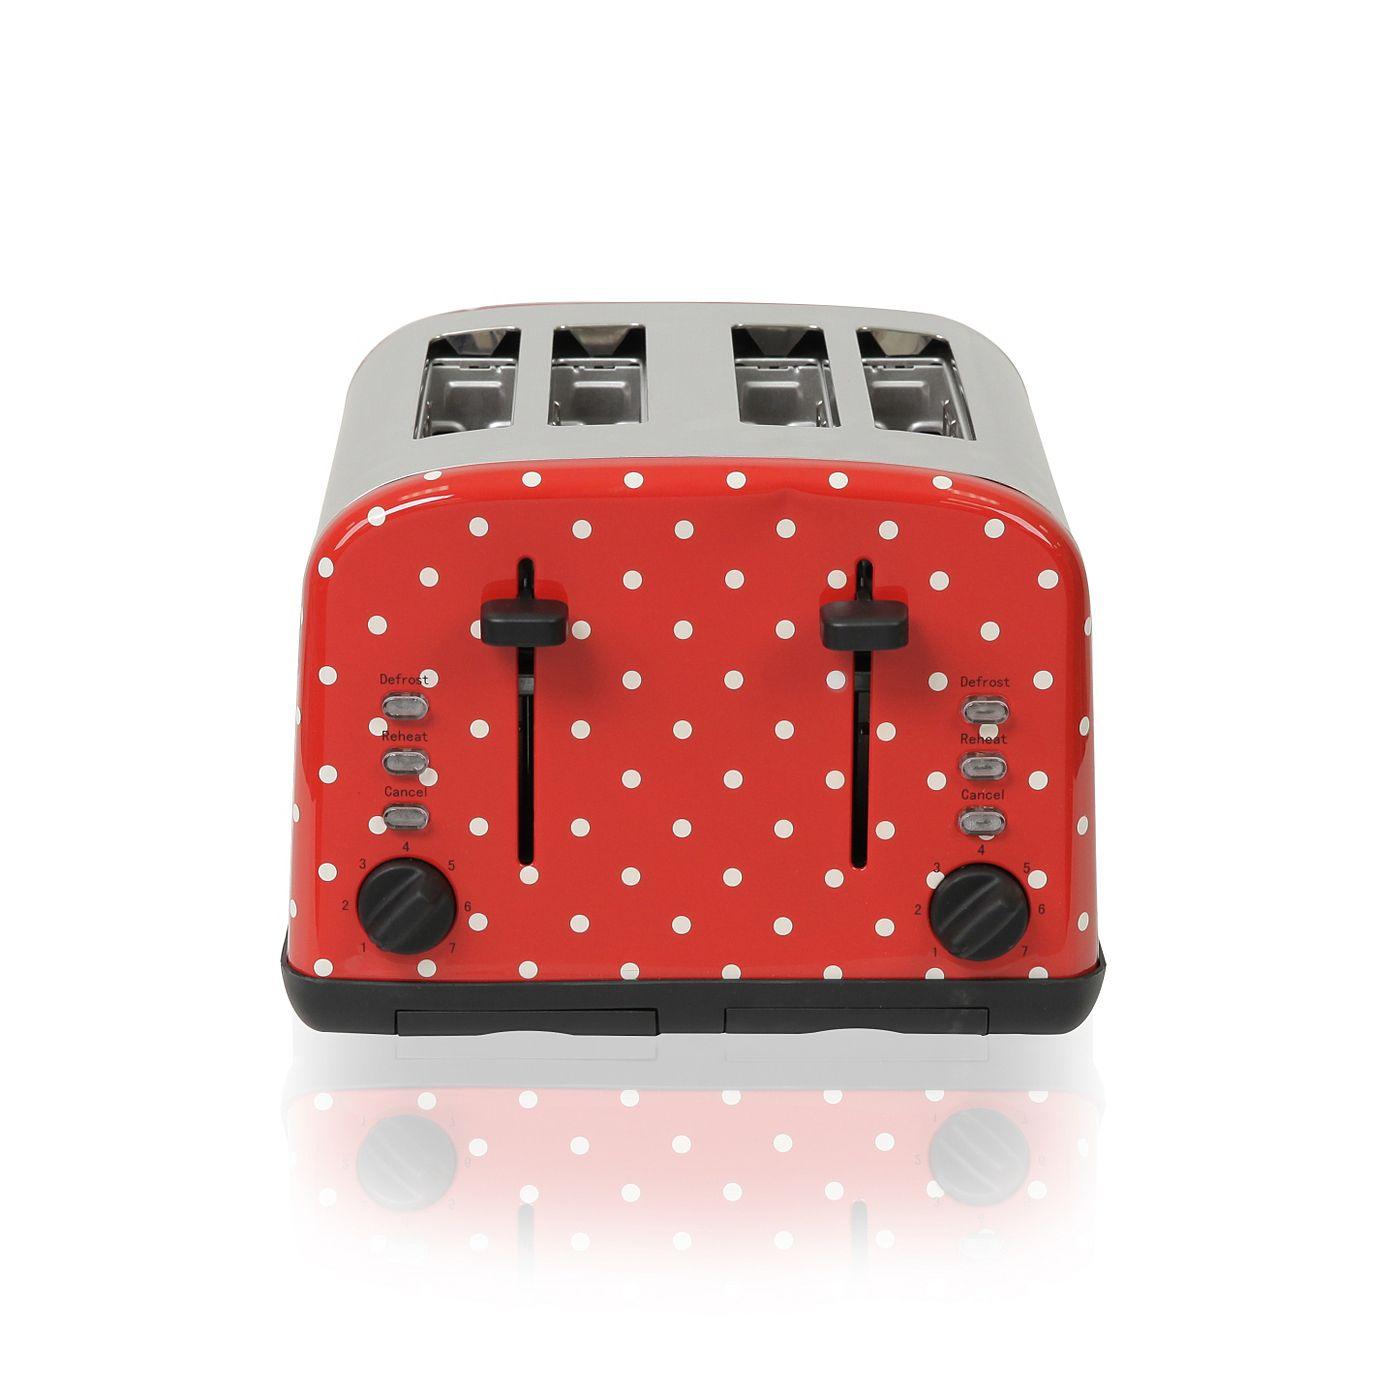 George Home 4 Slice Toaster - Polka Dot | Toasters | ASDA direct ...